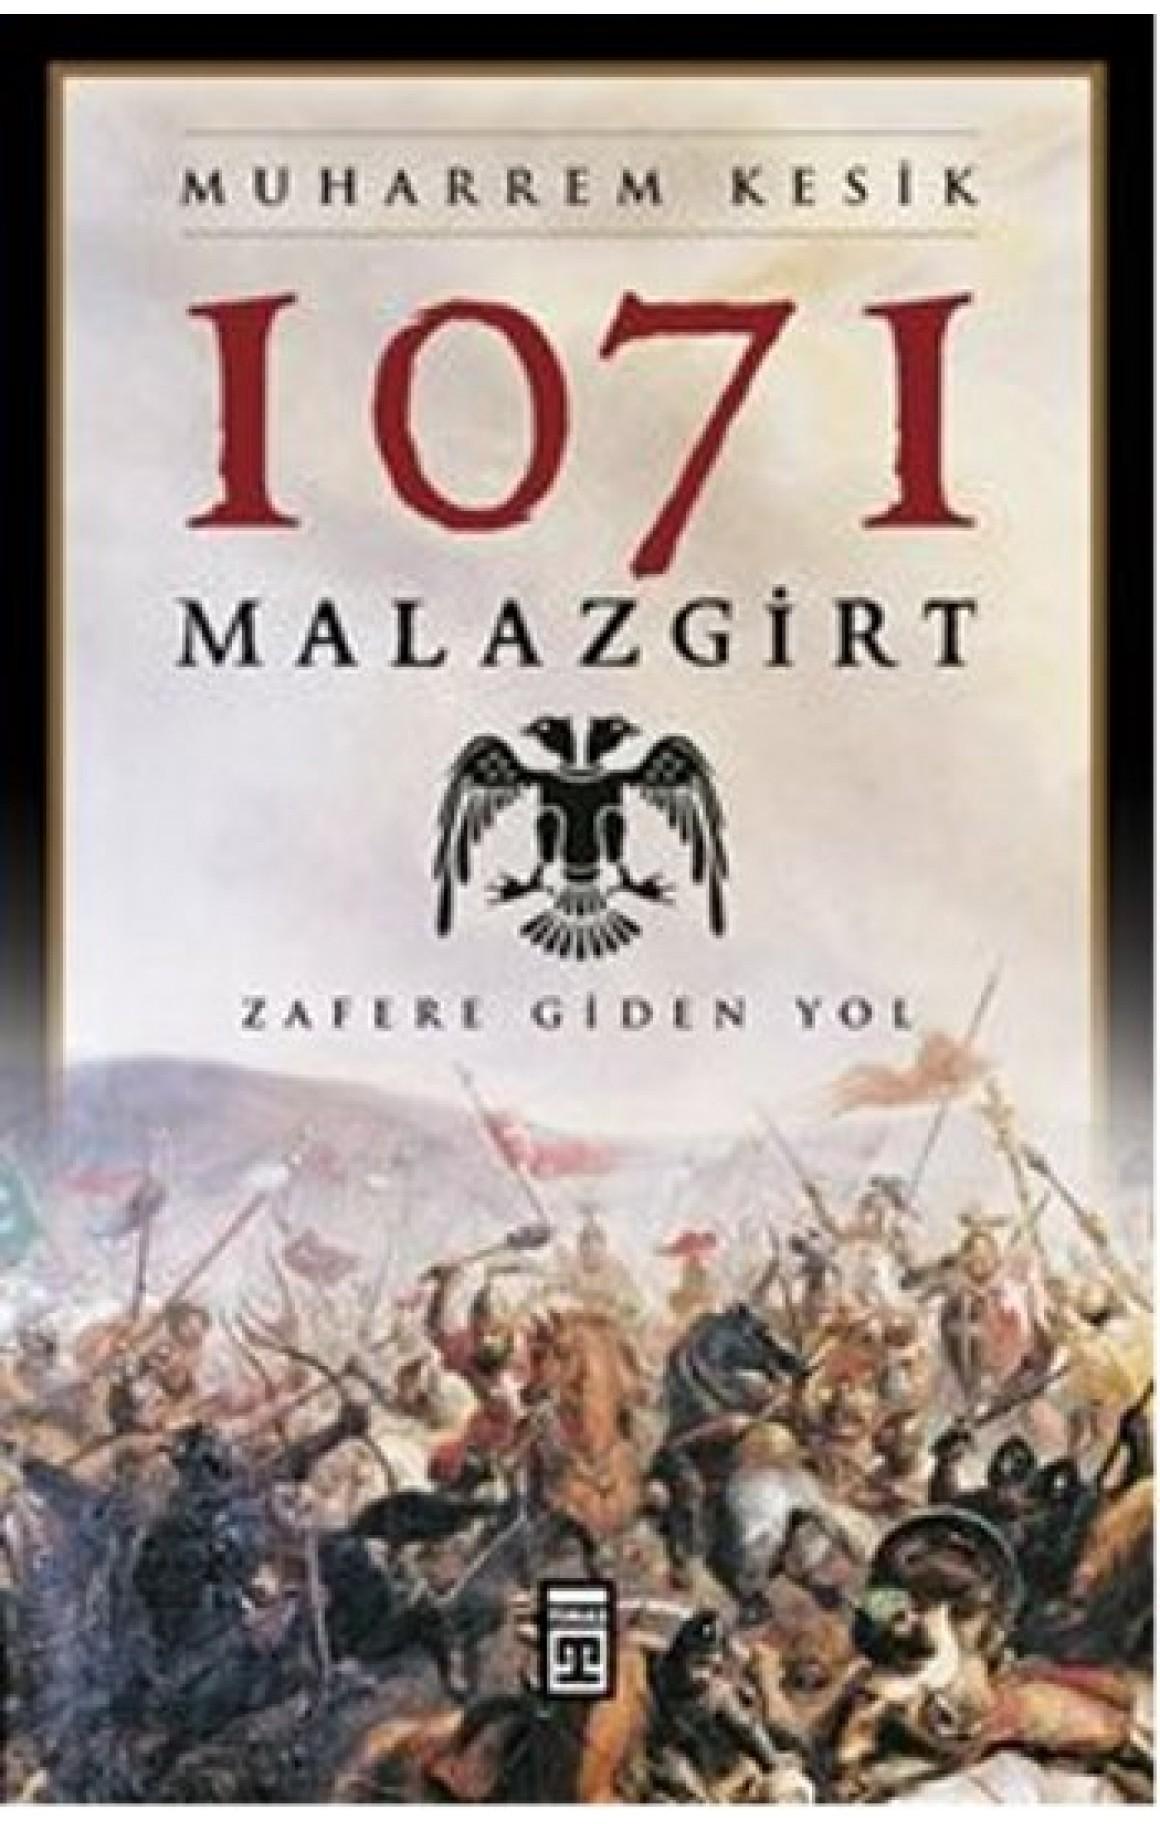 1071 Malazgirt